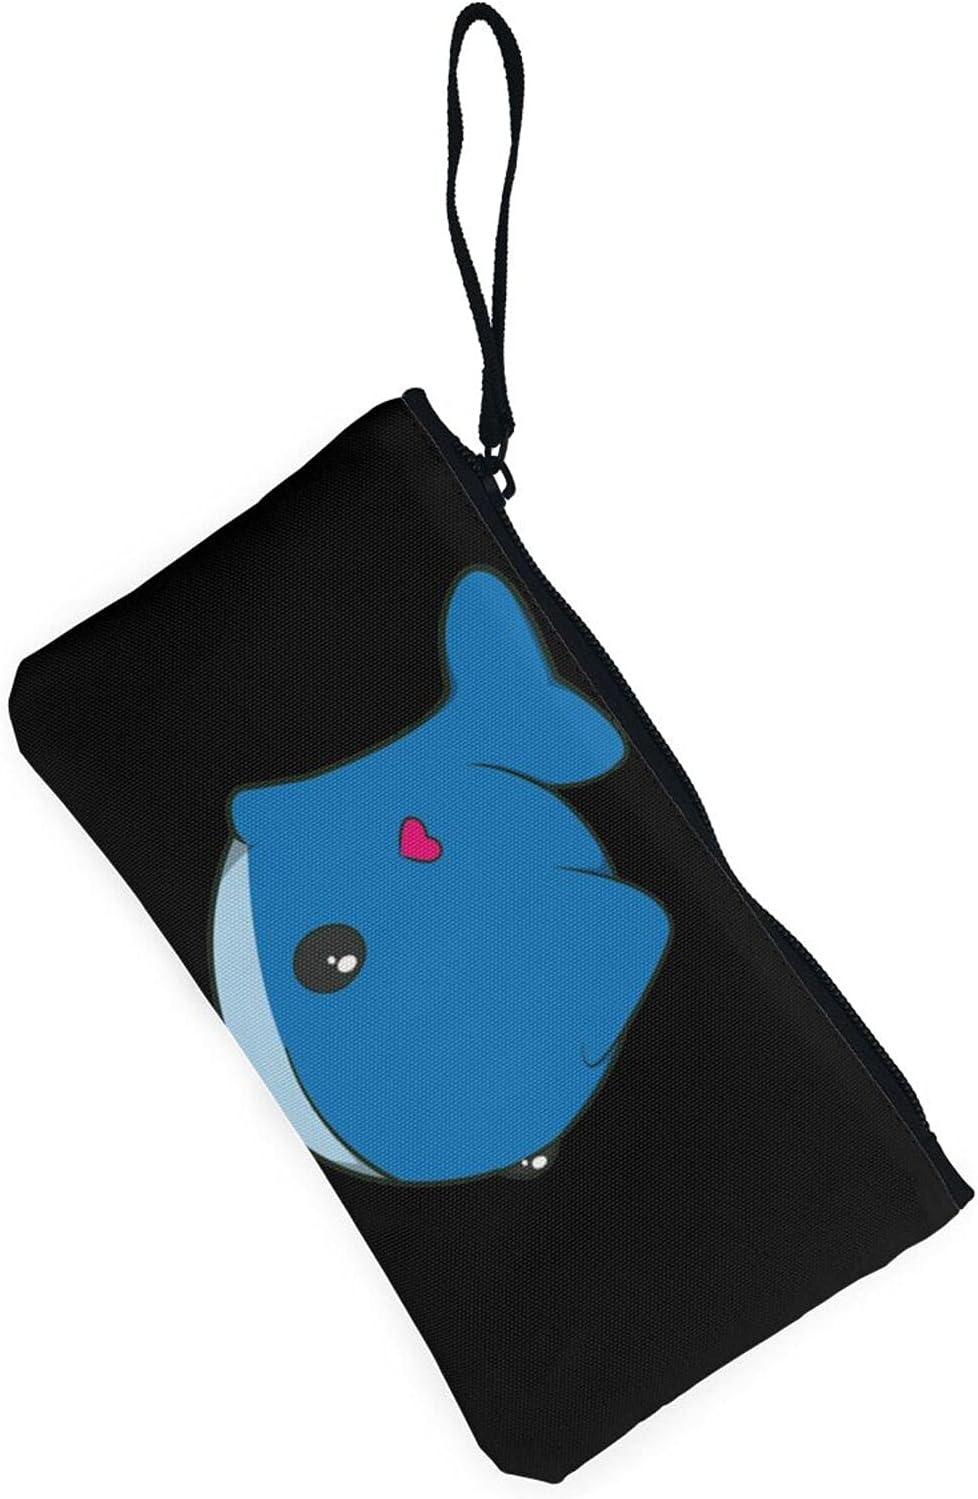 AORRUAM Cute whale Canvas Coin Purse,Canvas Zipper Pencil Cases,Canvas Change Purse Pouch Mini Wallet Coin Bag